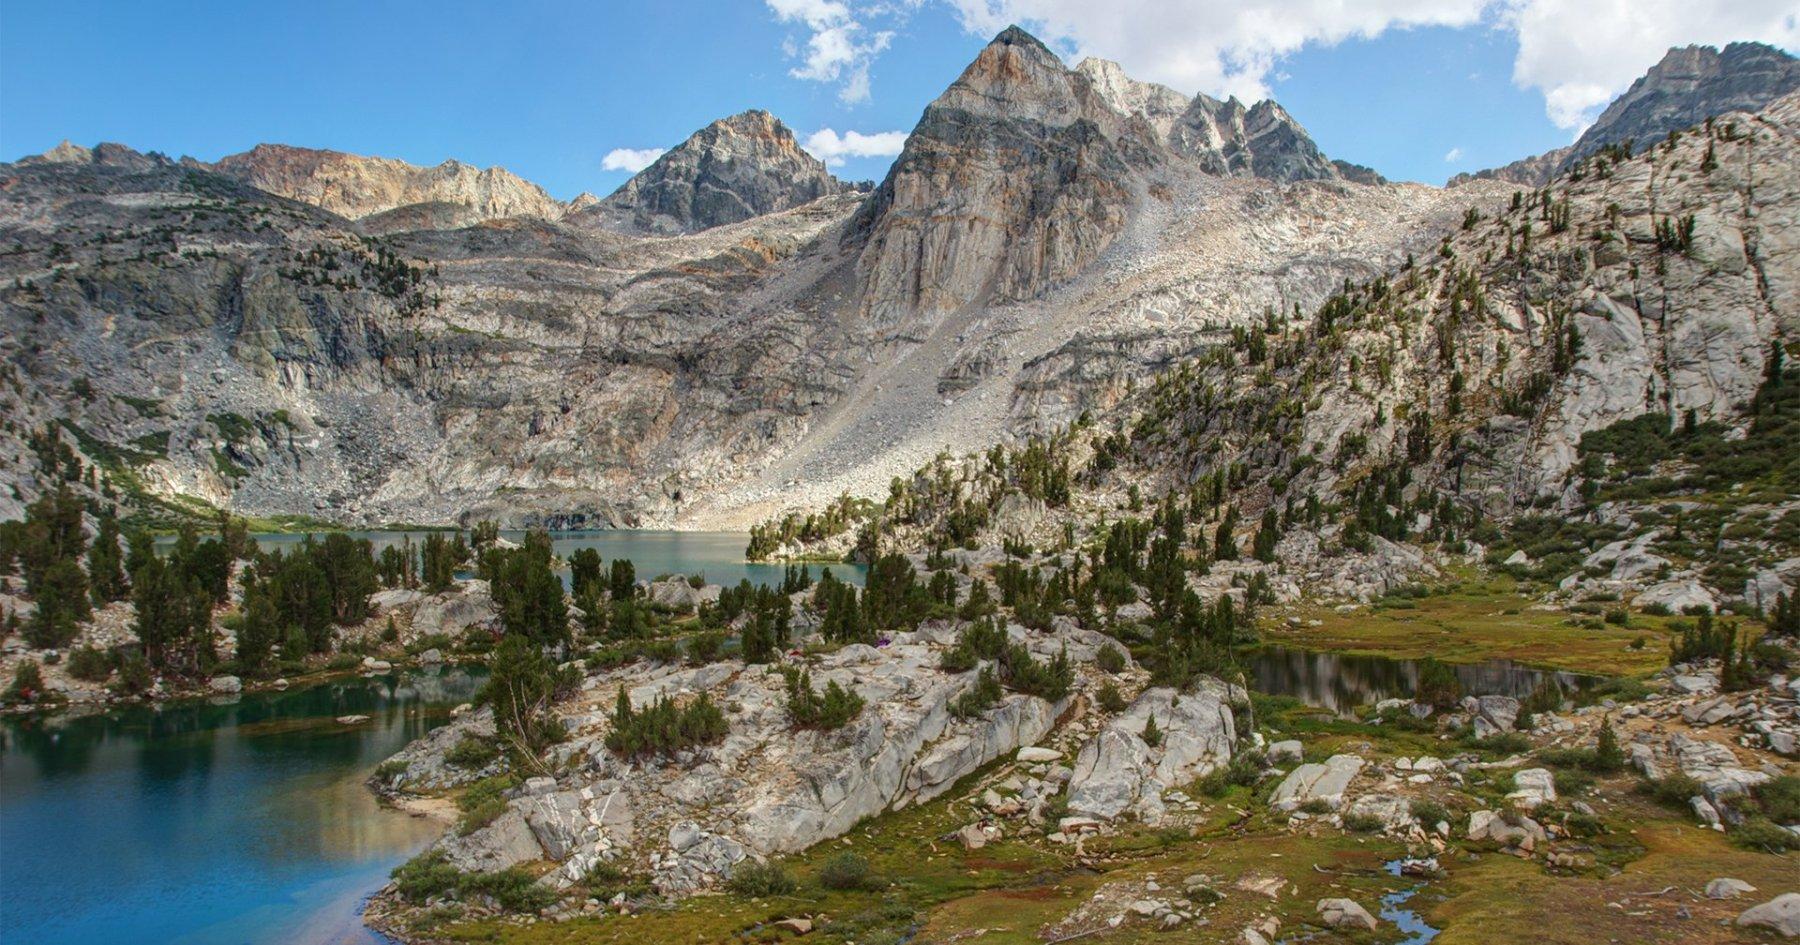 Gear Trails, Vol 2.: Hiking California